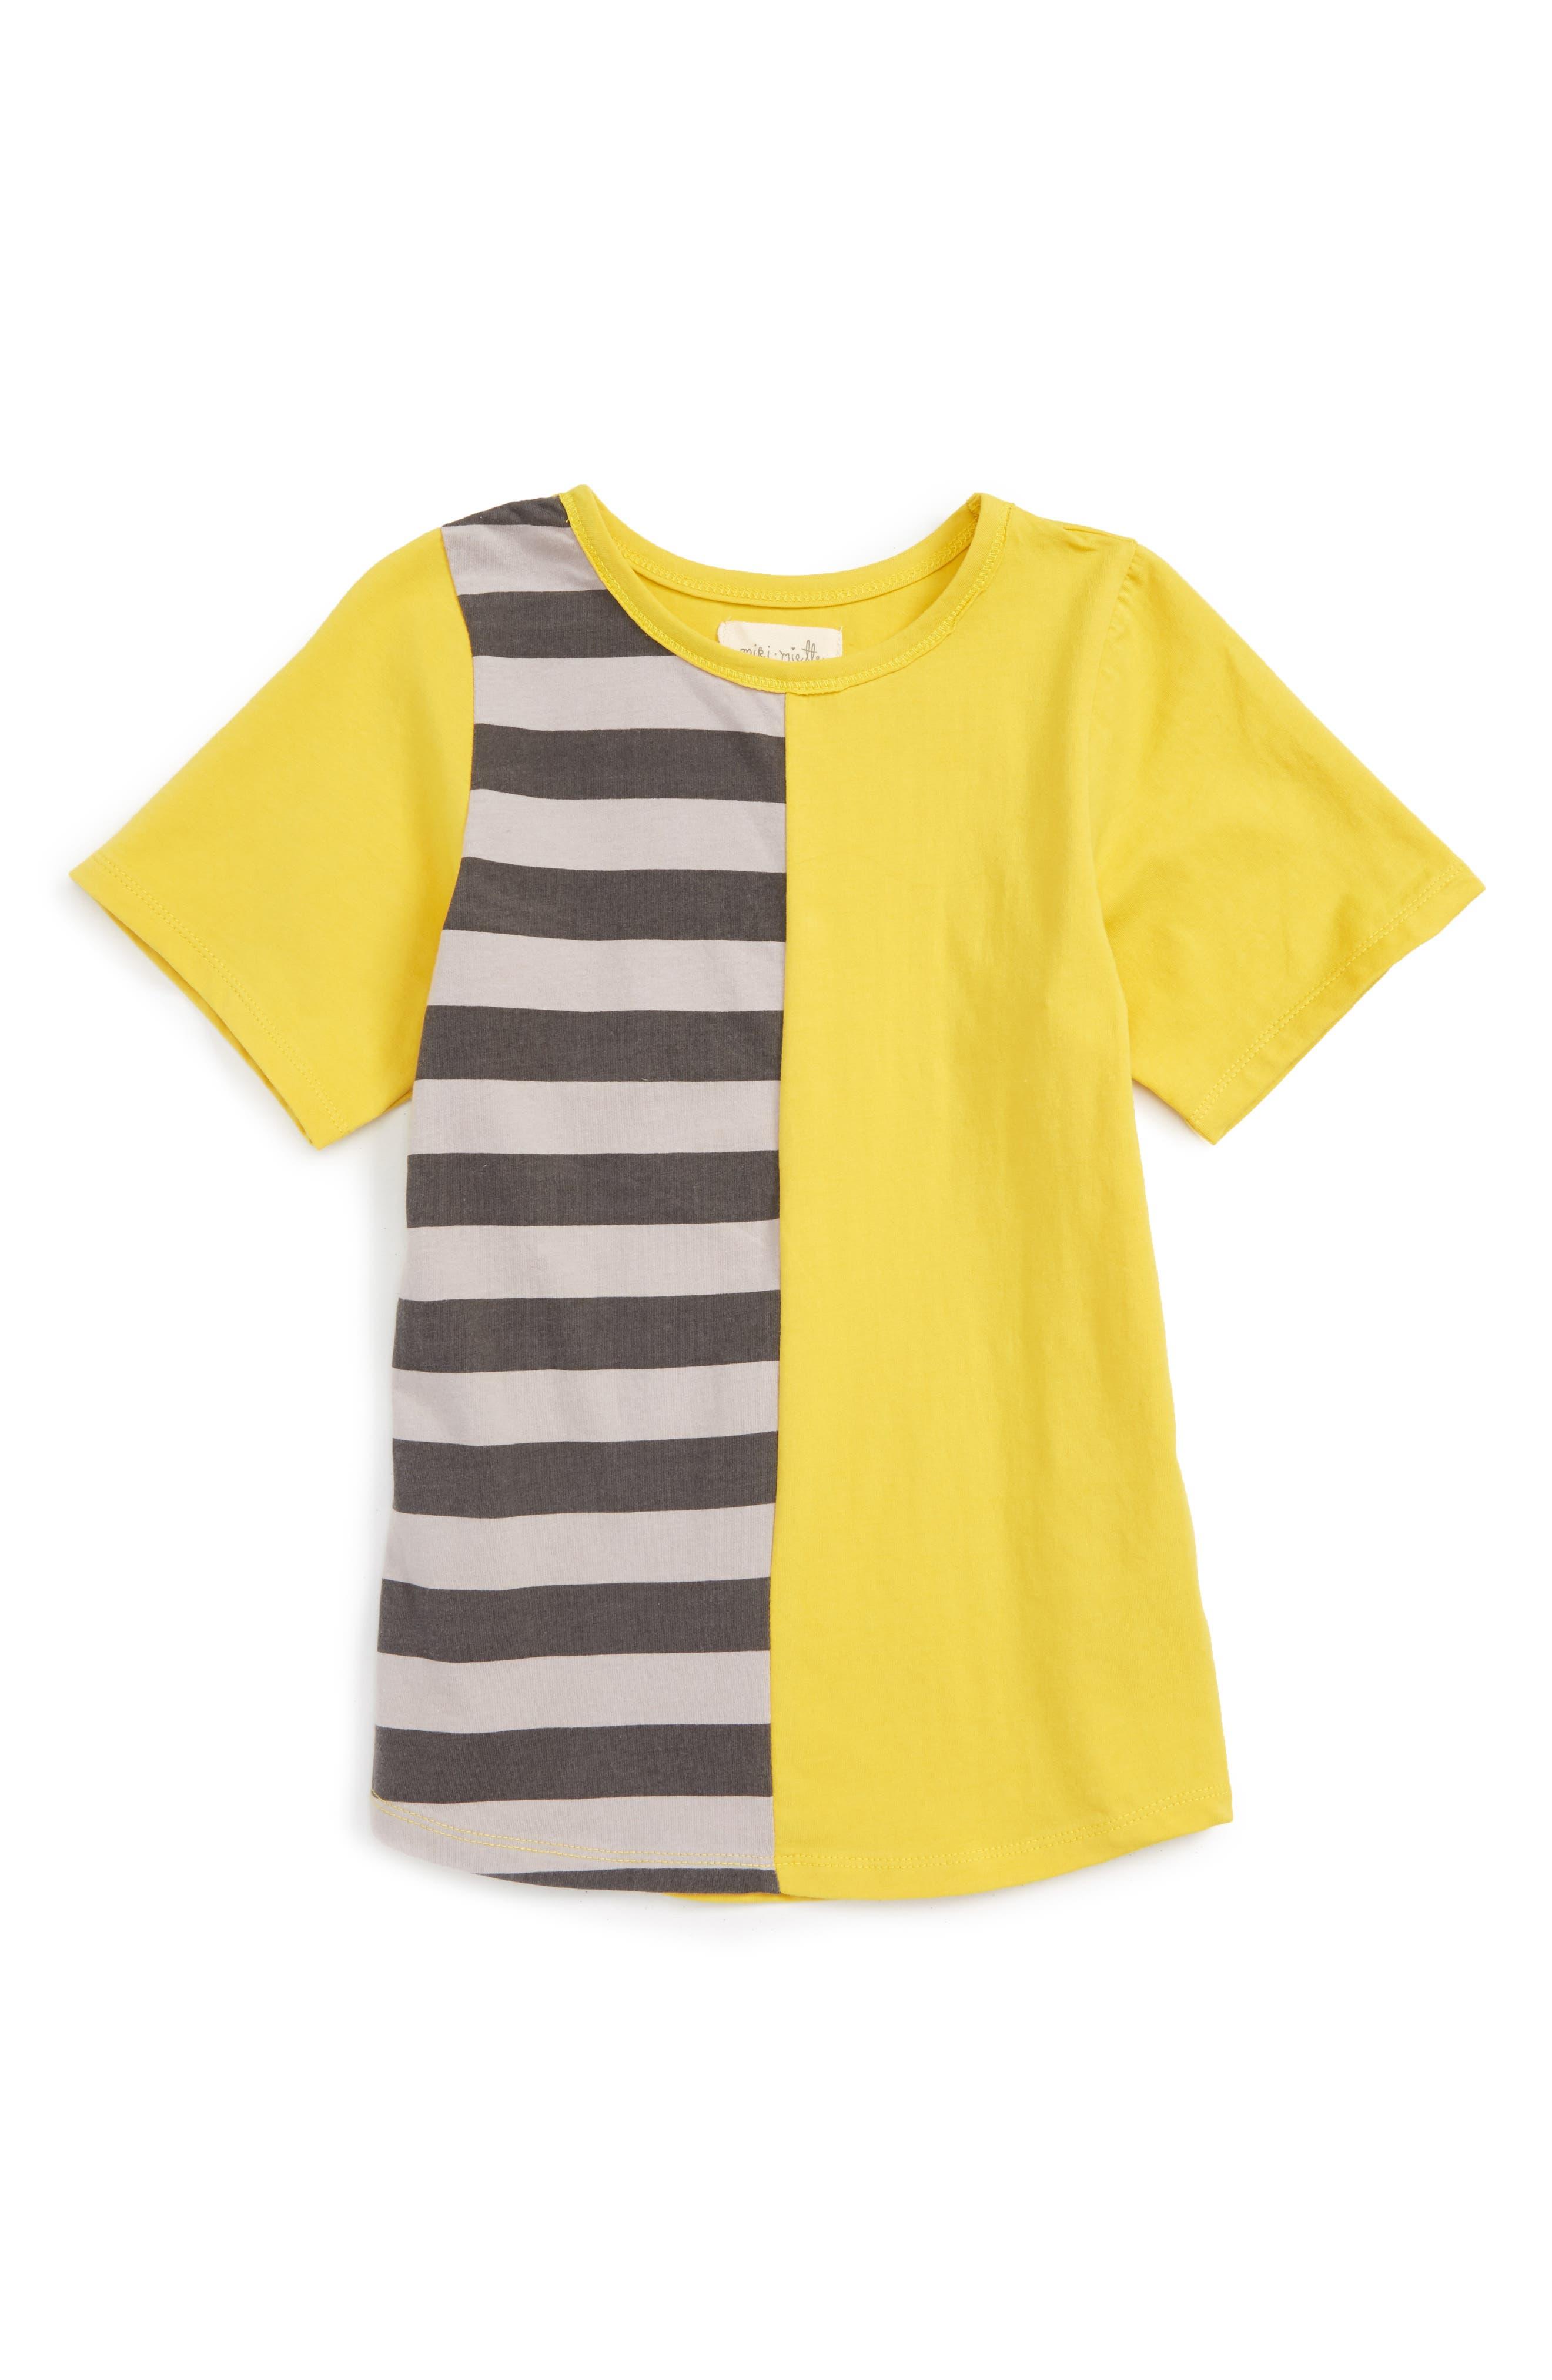 Miki Miette Sawyer T-Shirt (Toddler Boys, Little Boys & Big Boys)